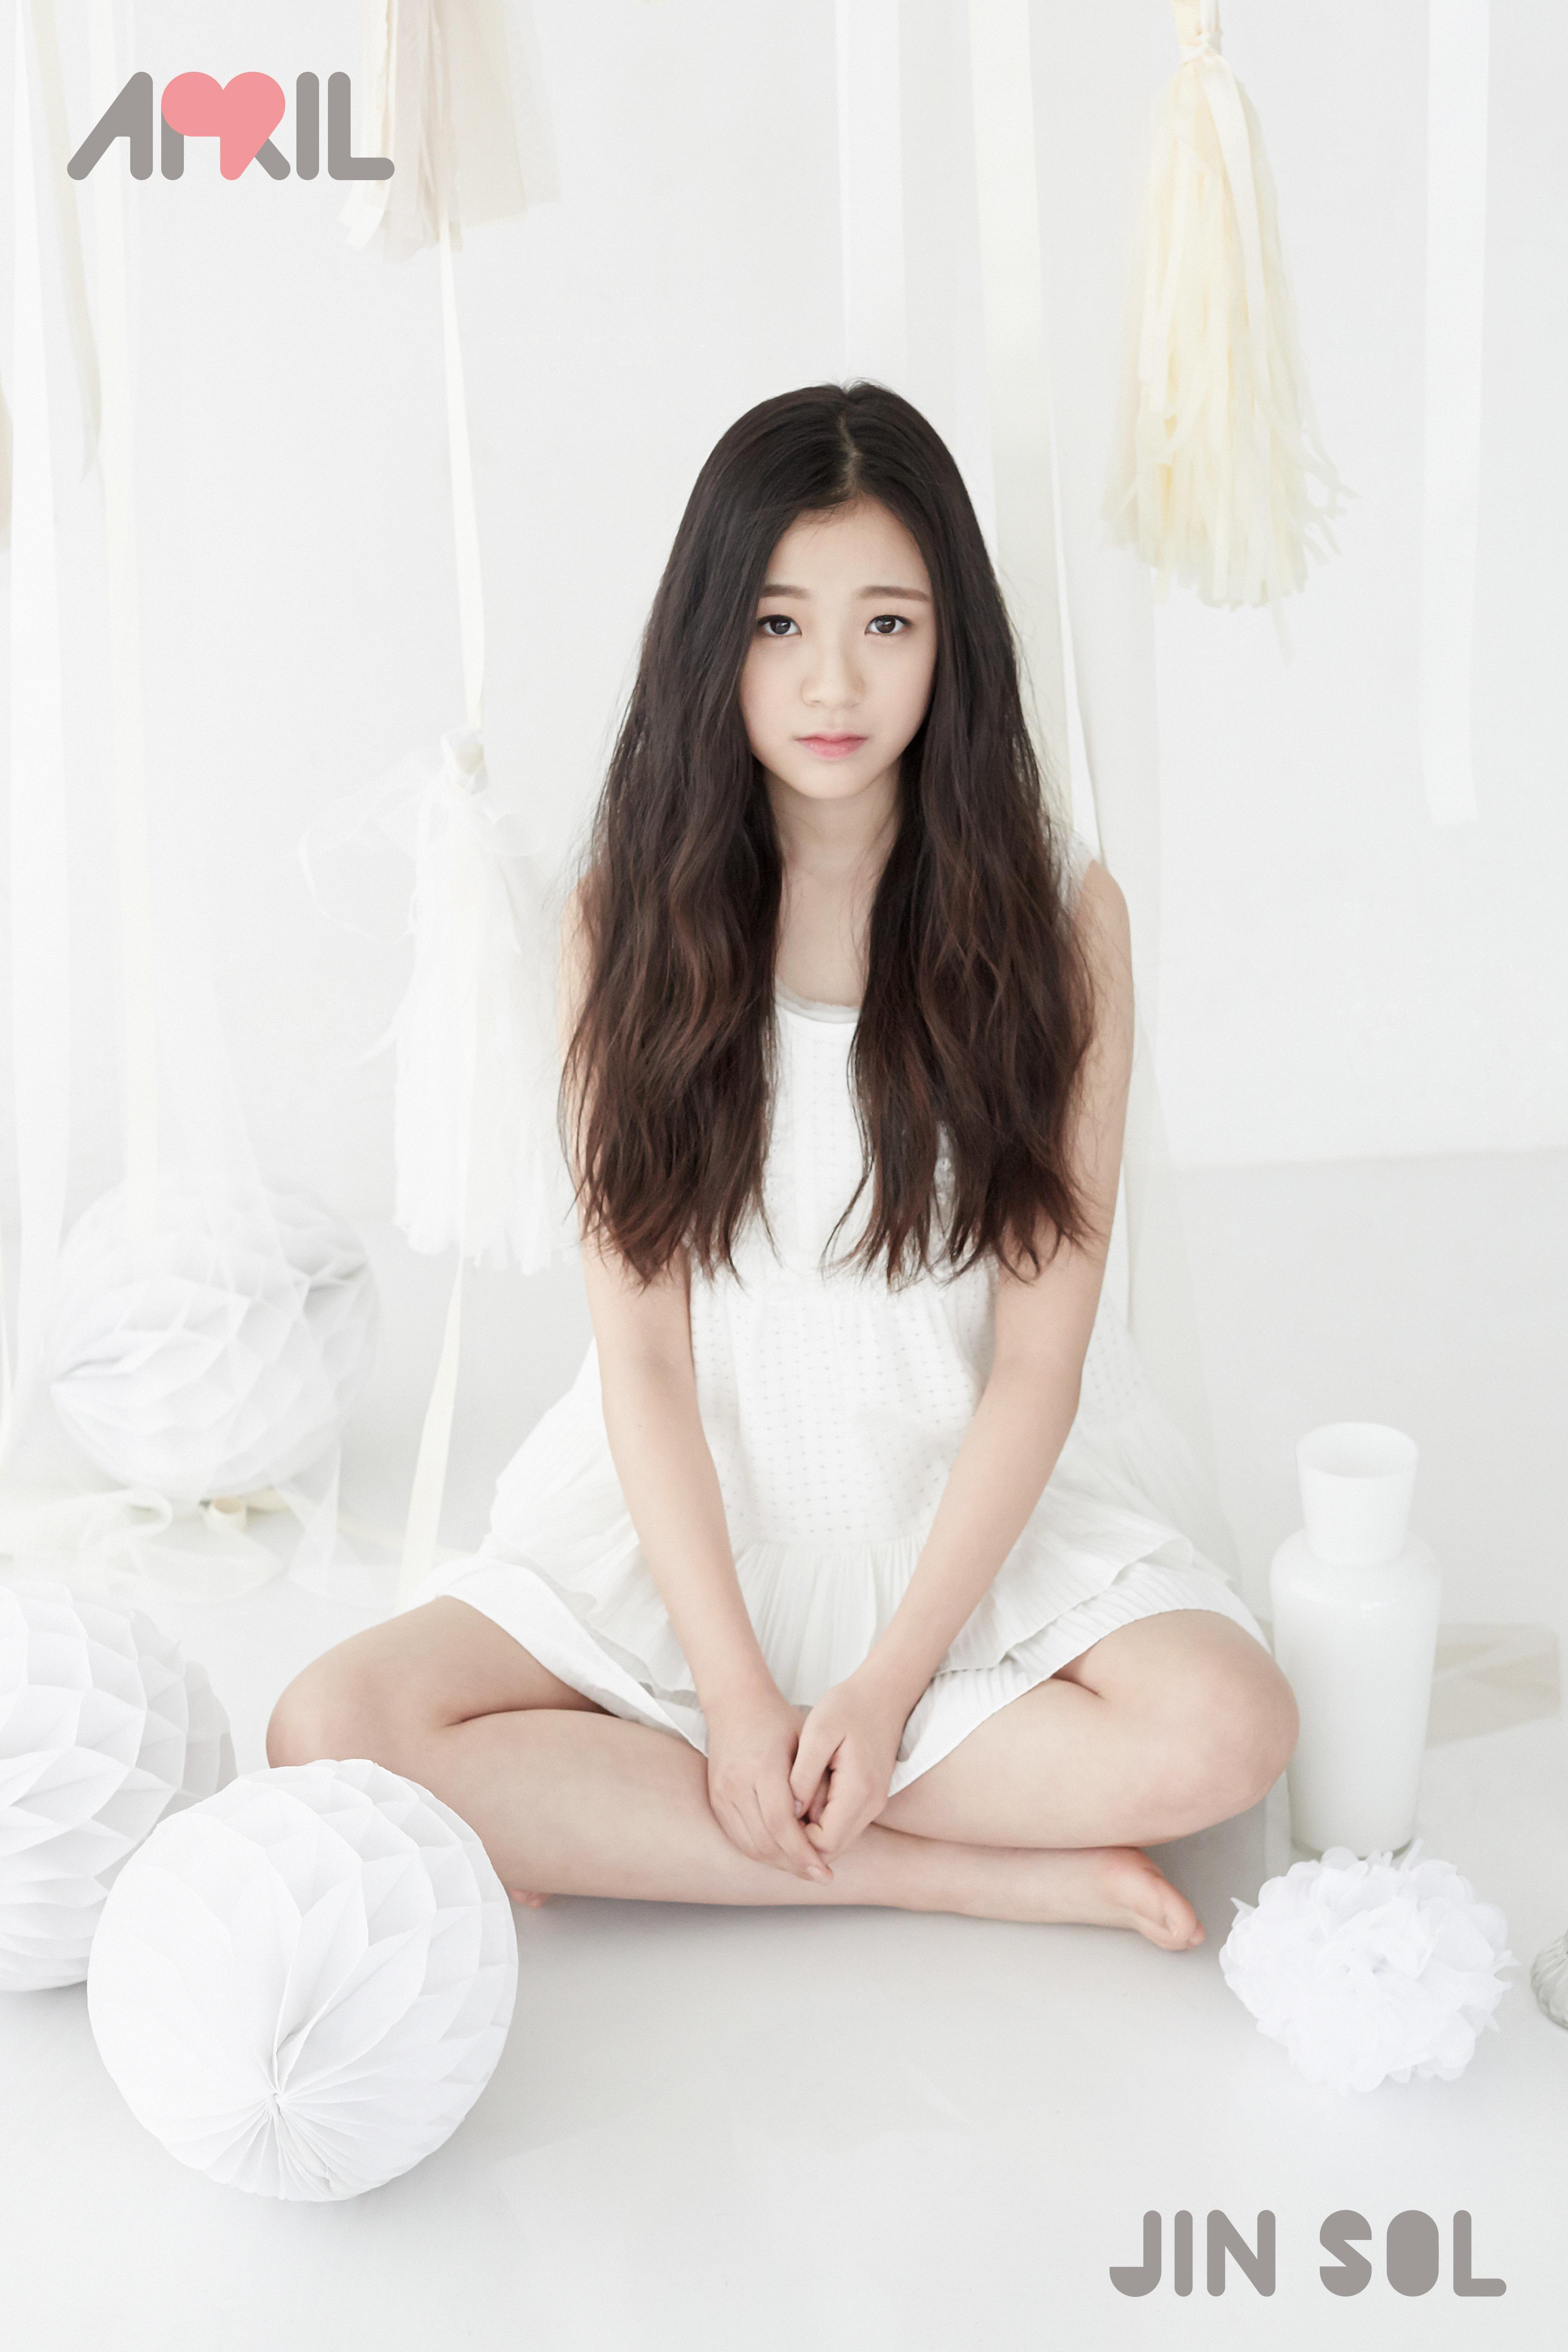 Jinsol6.jpg (3386×5079)